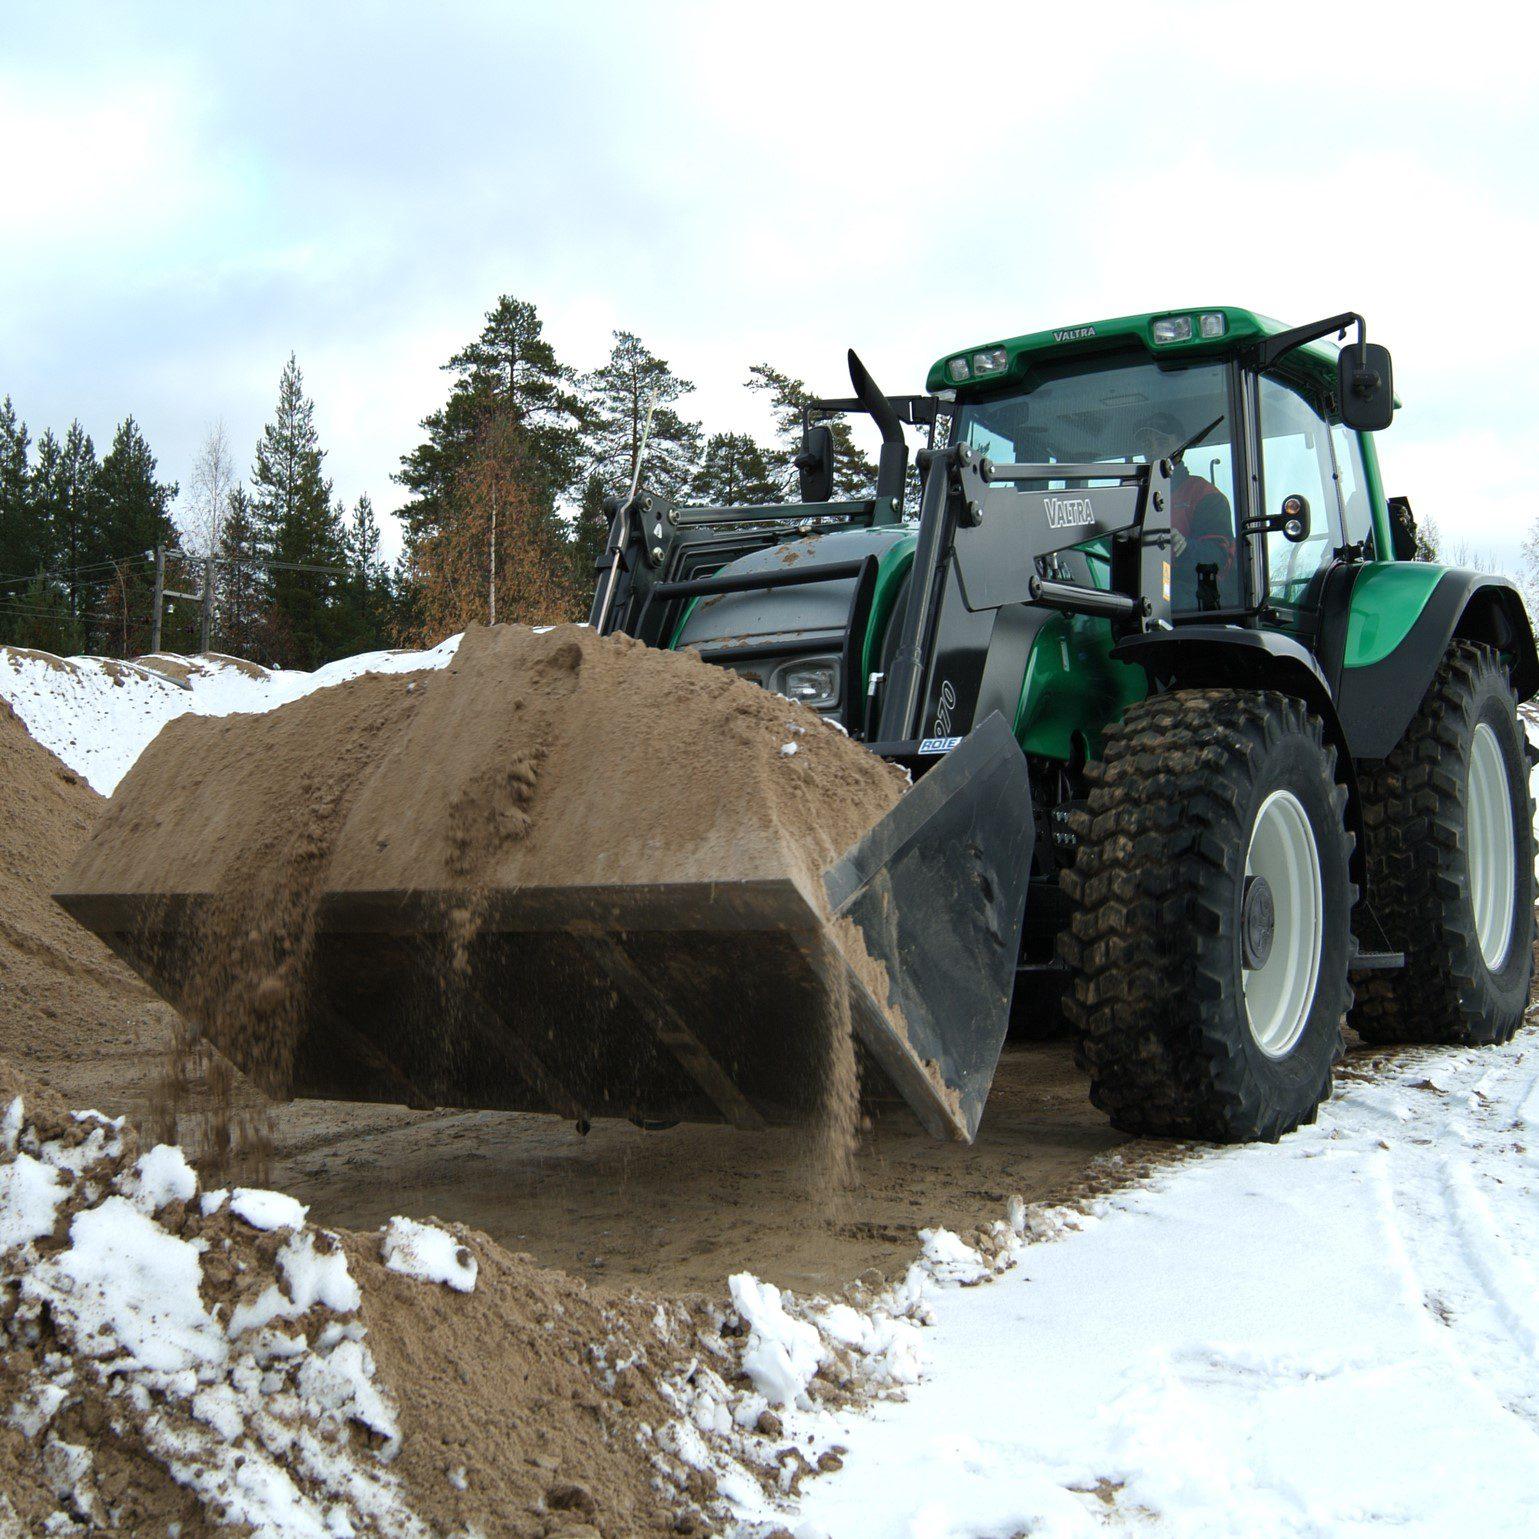 Gravel bucket at work